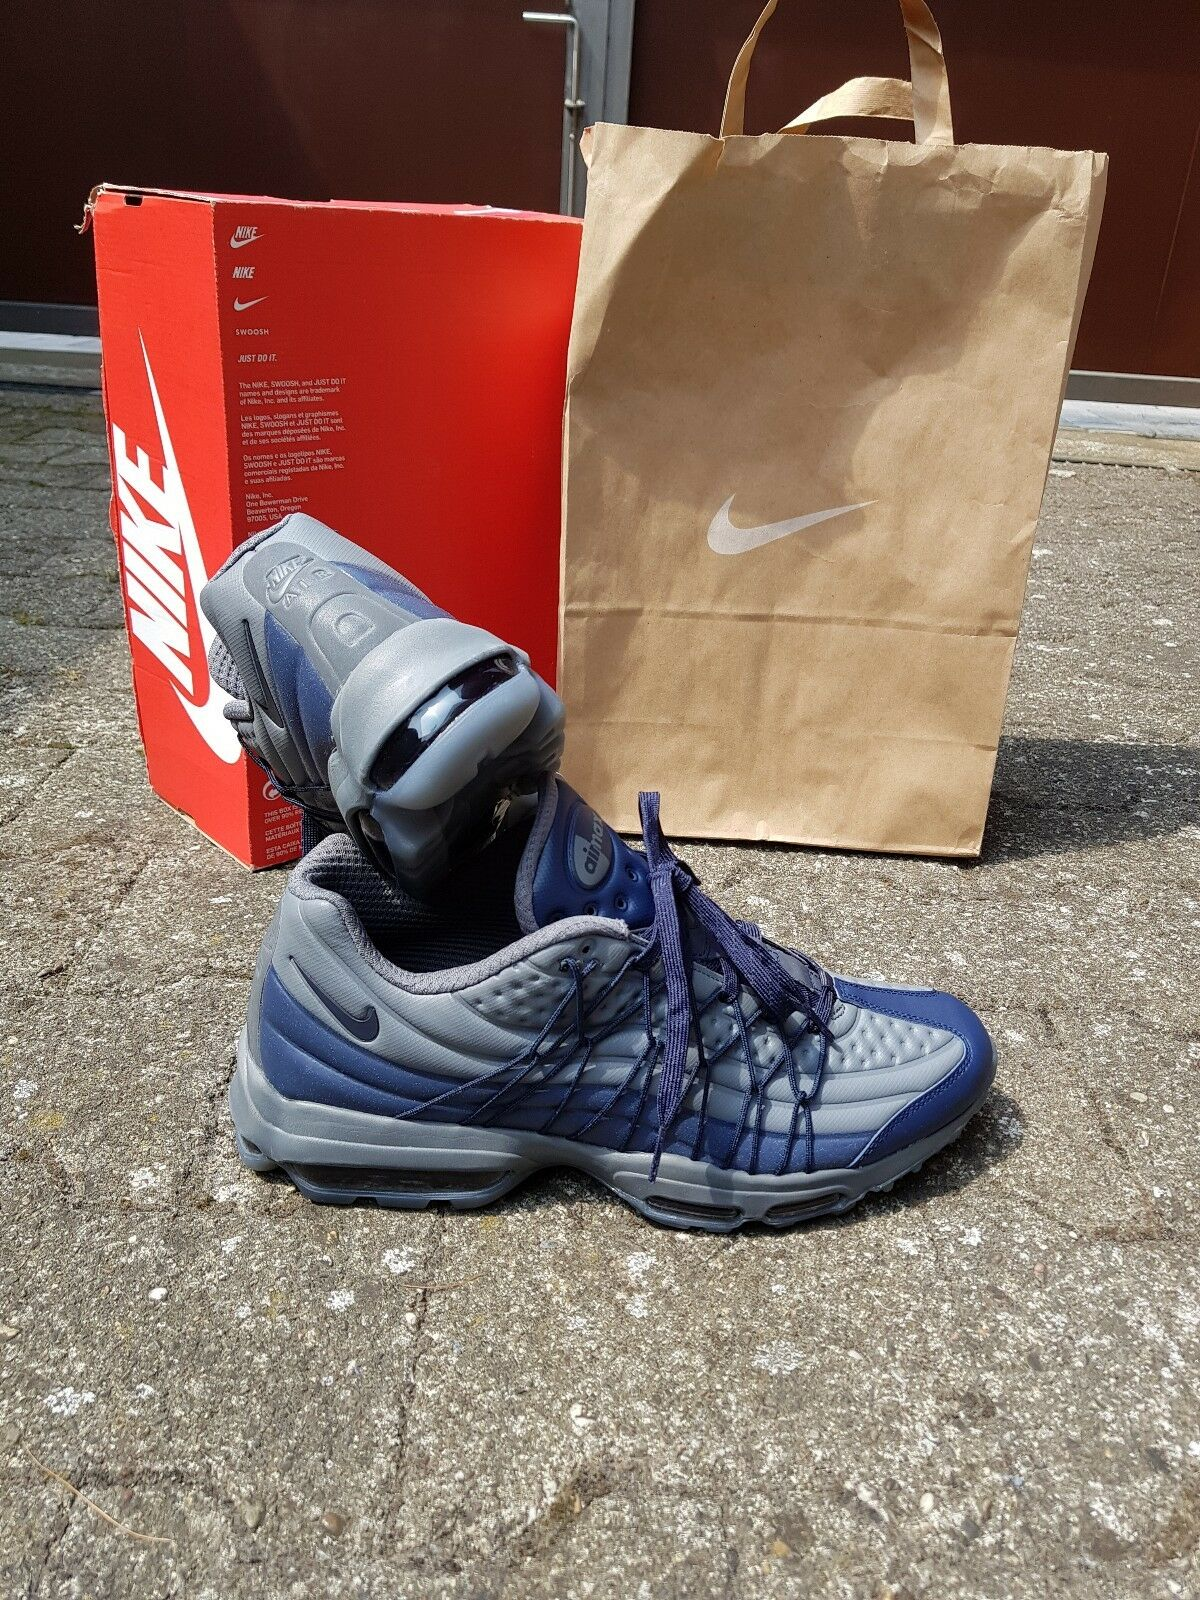 Nike Air Max 95 Ultra SE, Sneaker Herrenschuh Turnschuhe, EU 46, Grey & Navy NEU